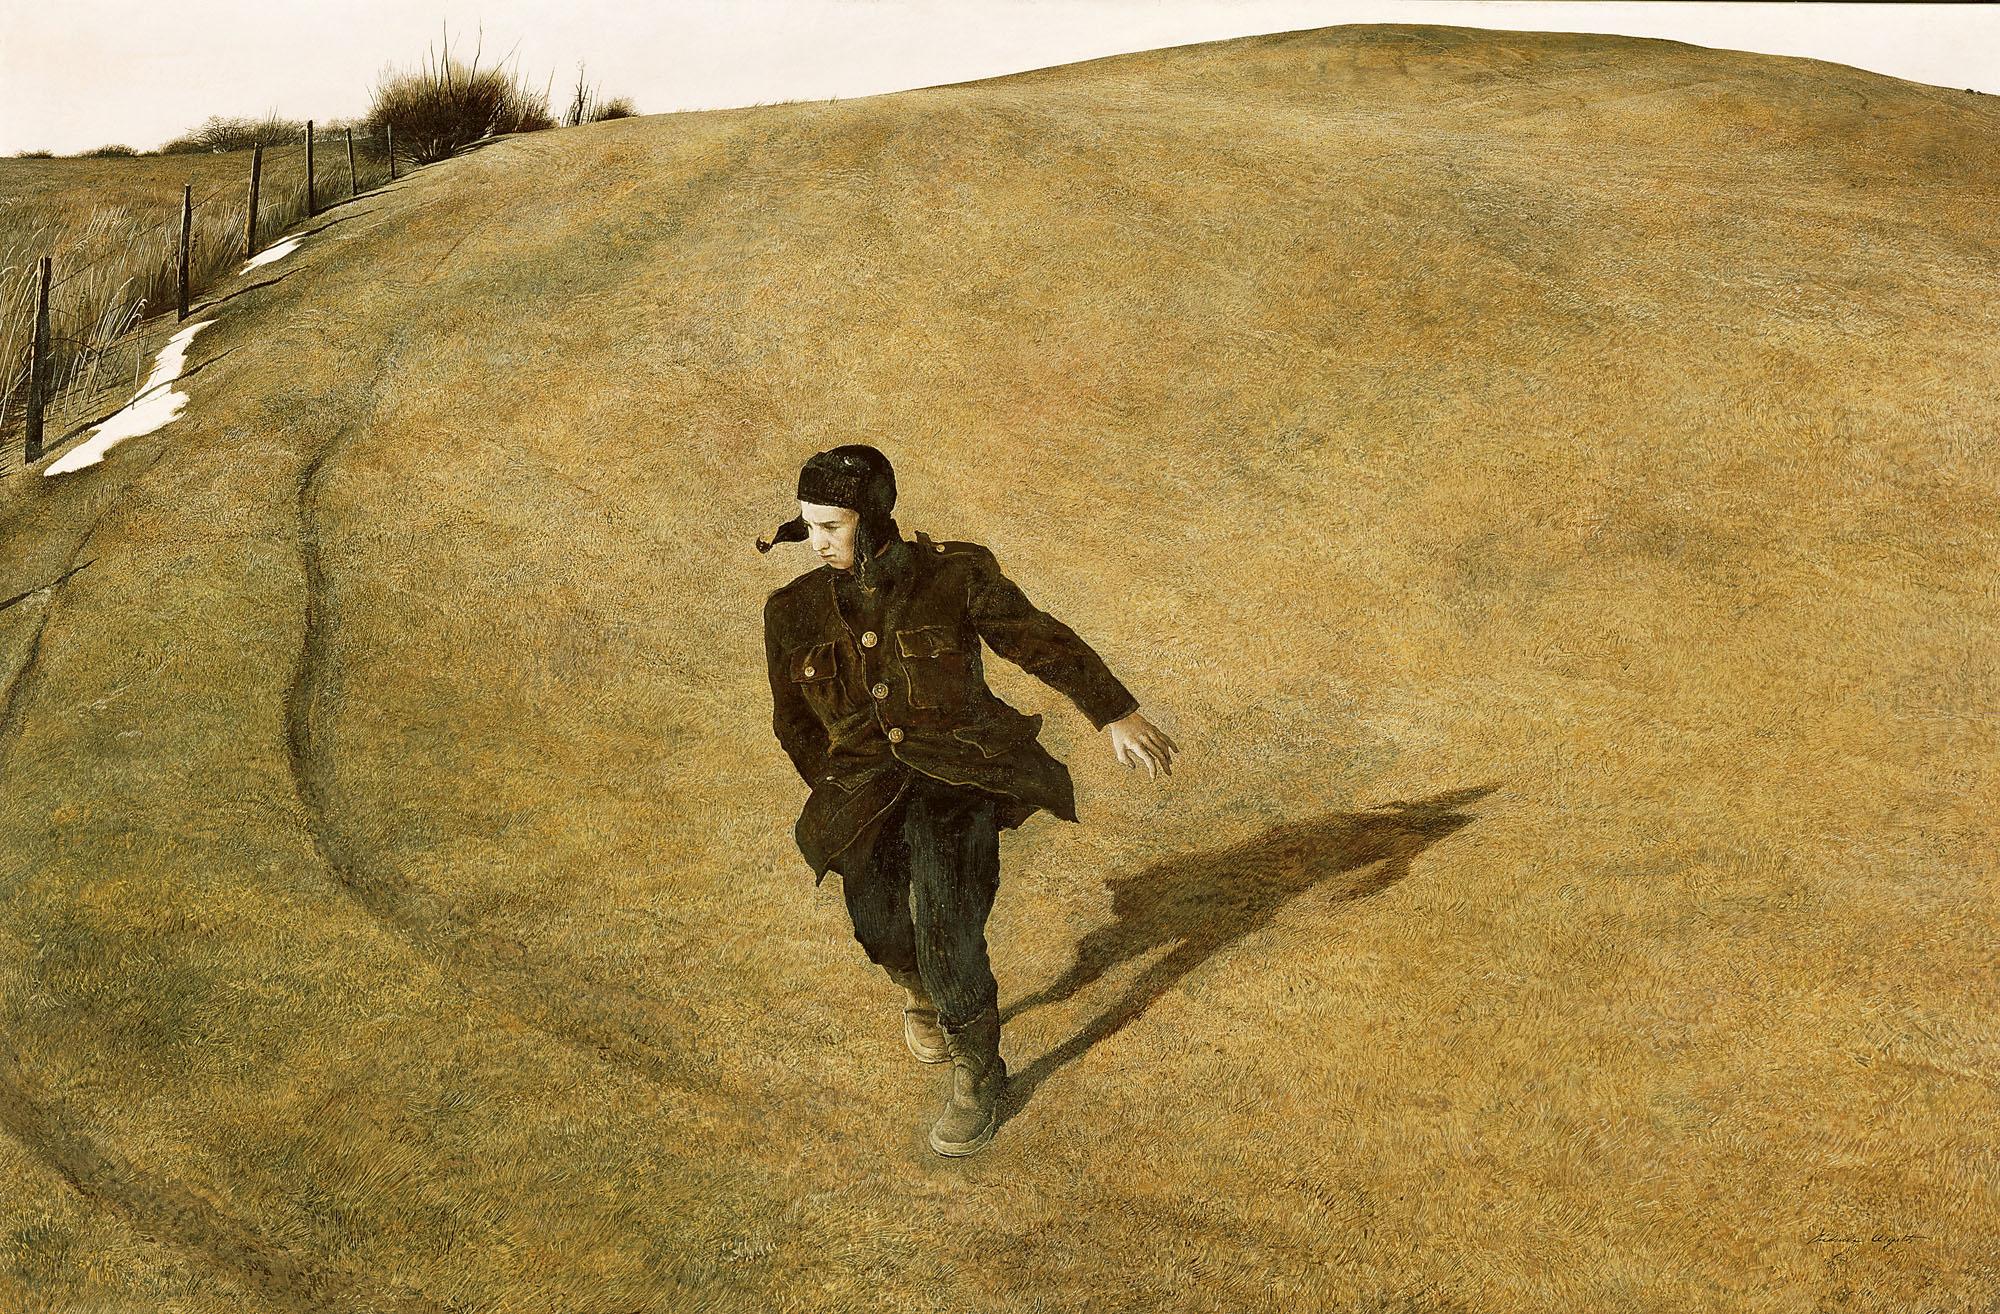 The Unfolding Creative Process of Artist Jordan Sokol